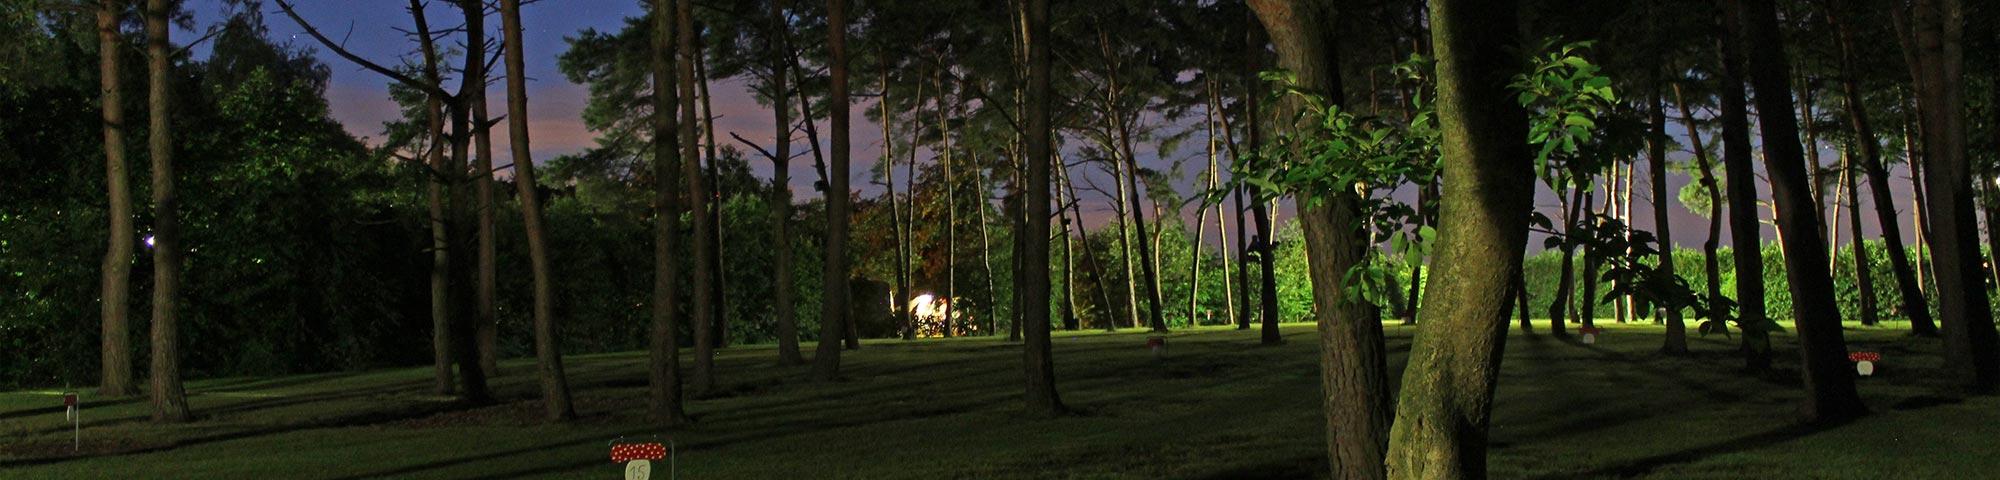 Nacht_bos